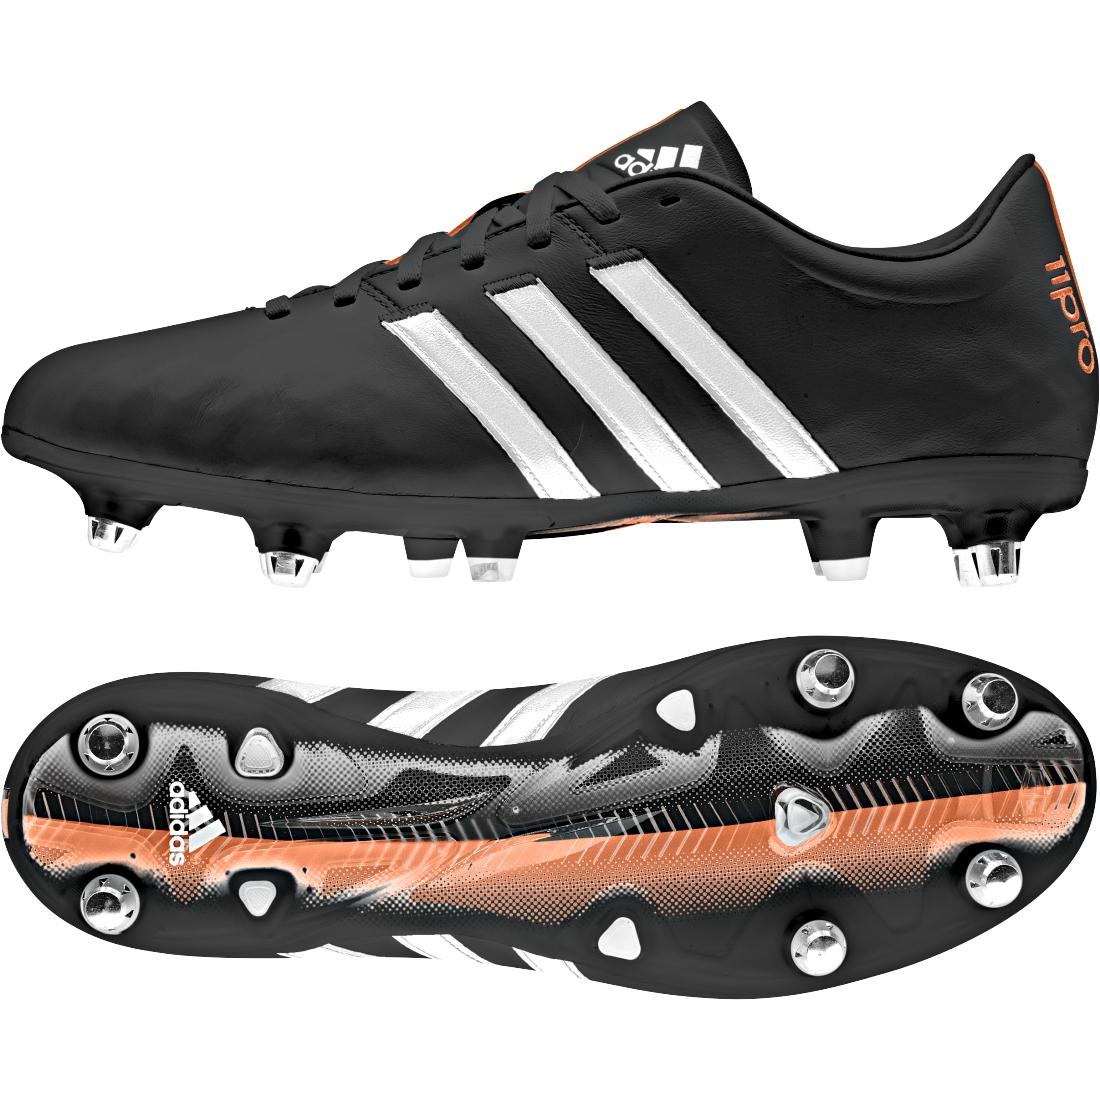 Image of   Adidas 11 Pro Fg fodboldstøvle